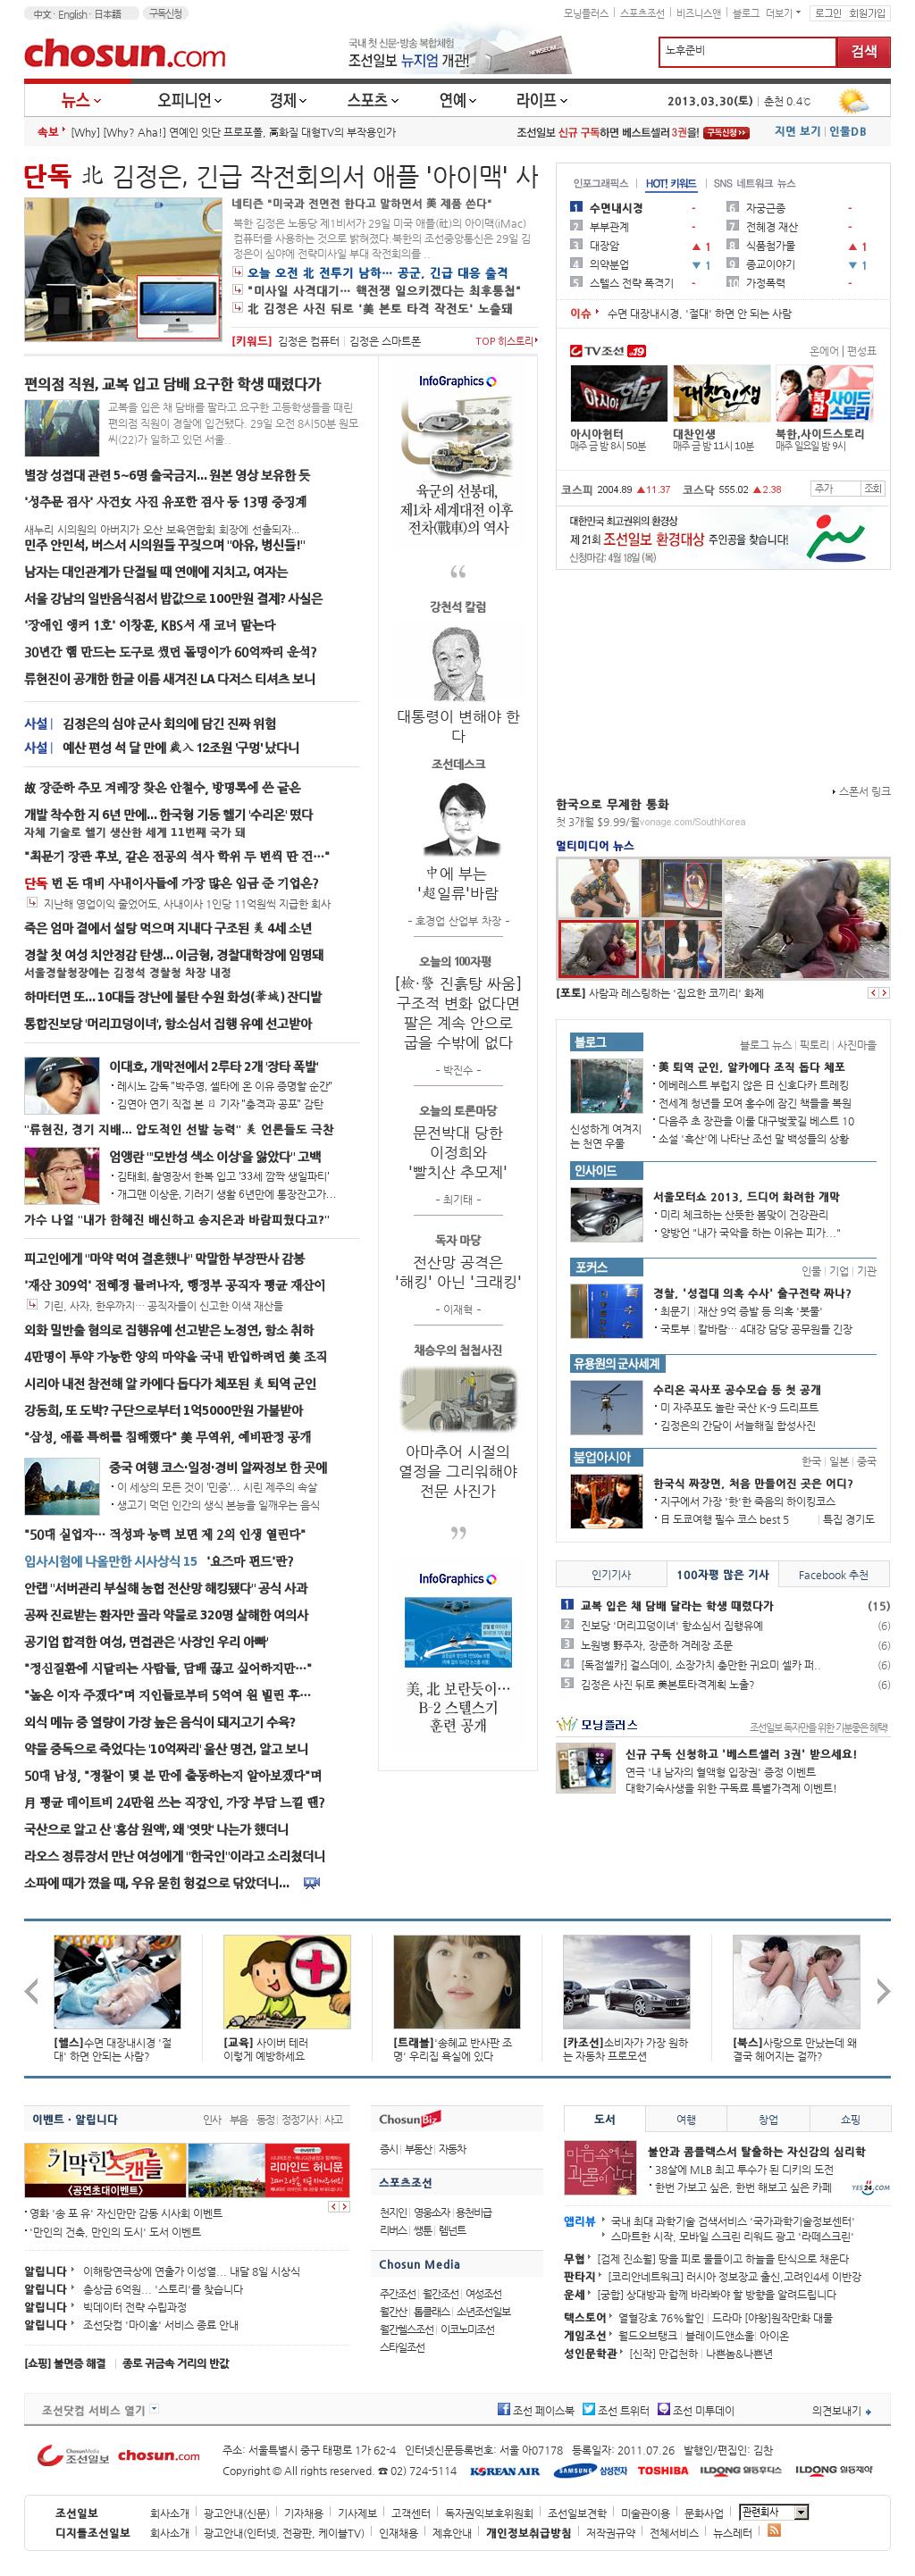 chosun.com at Friday March 29, 2013, 7:03 p.m. UTC